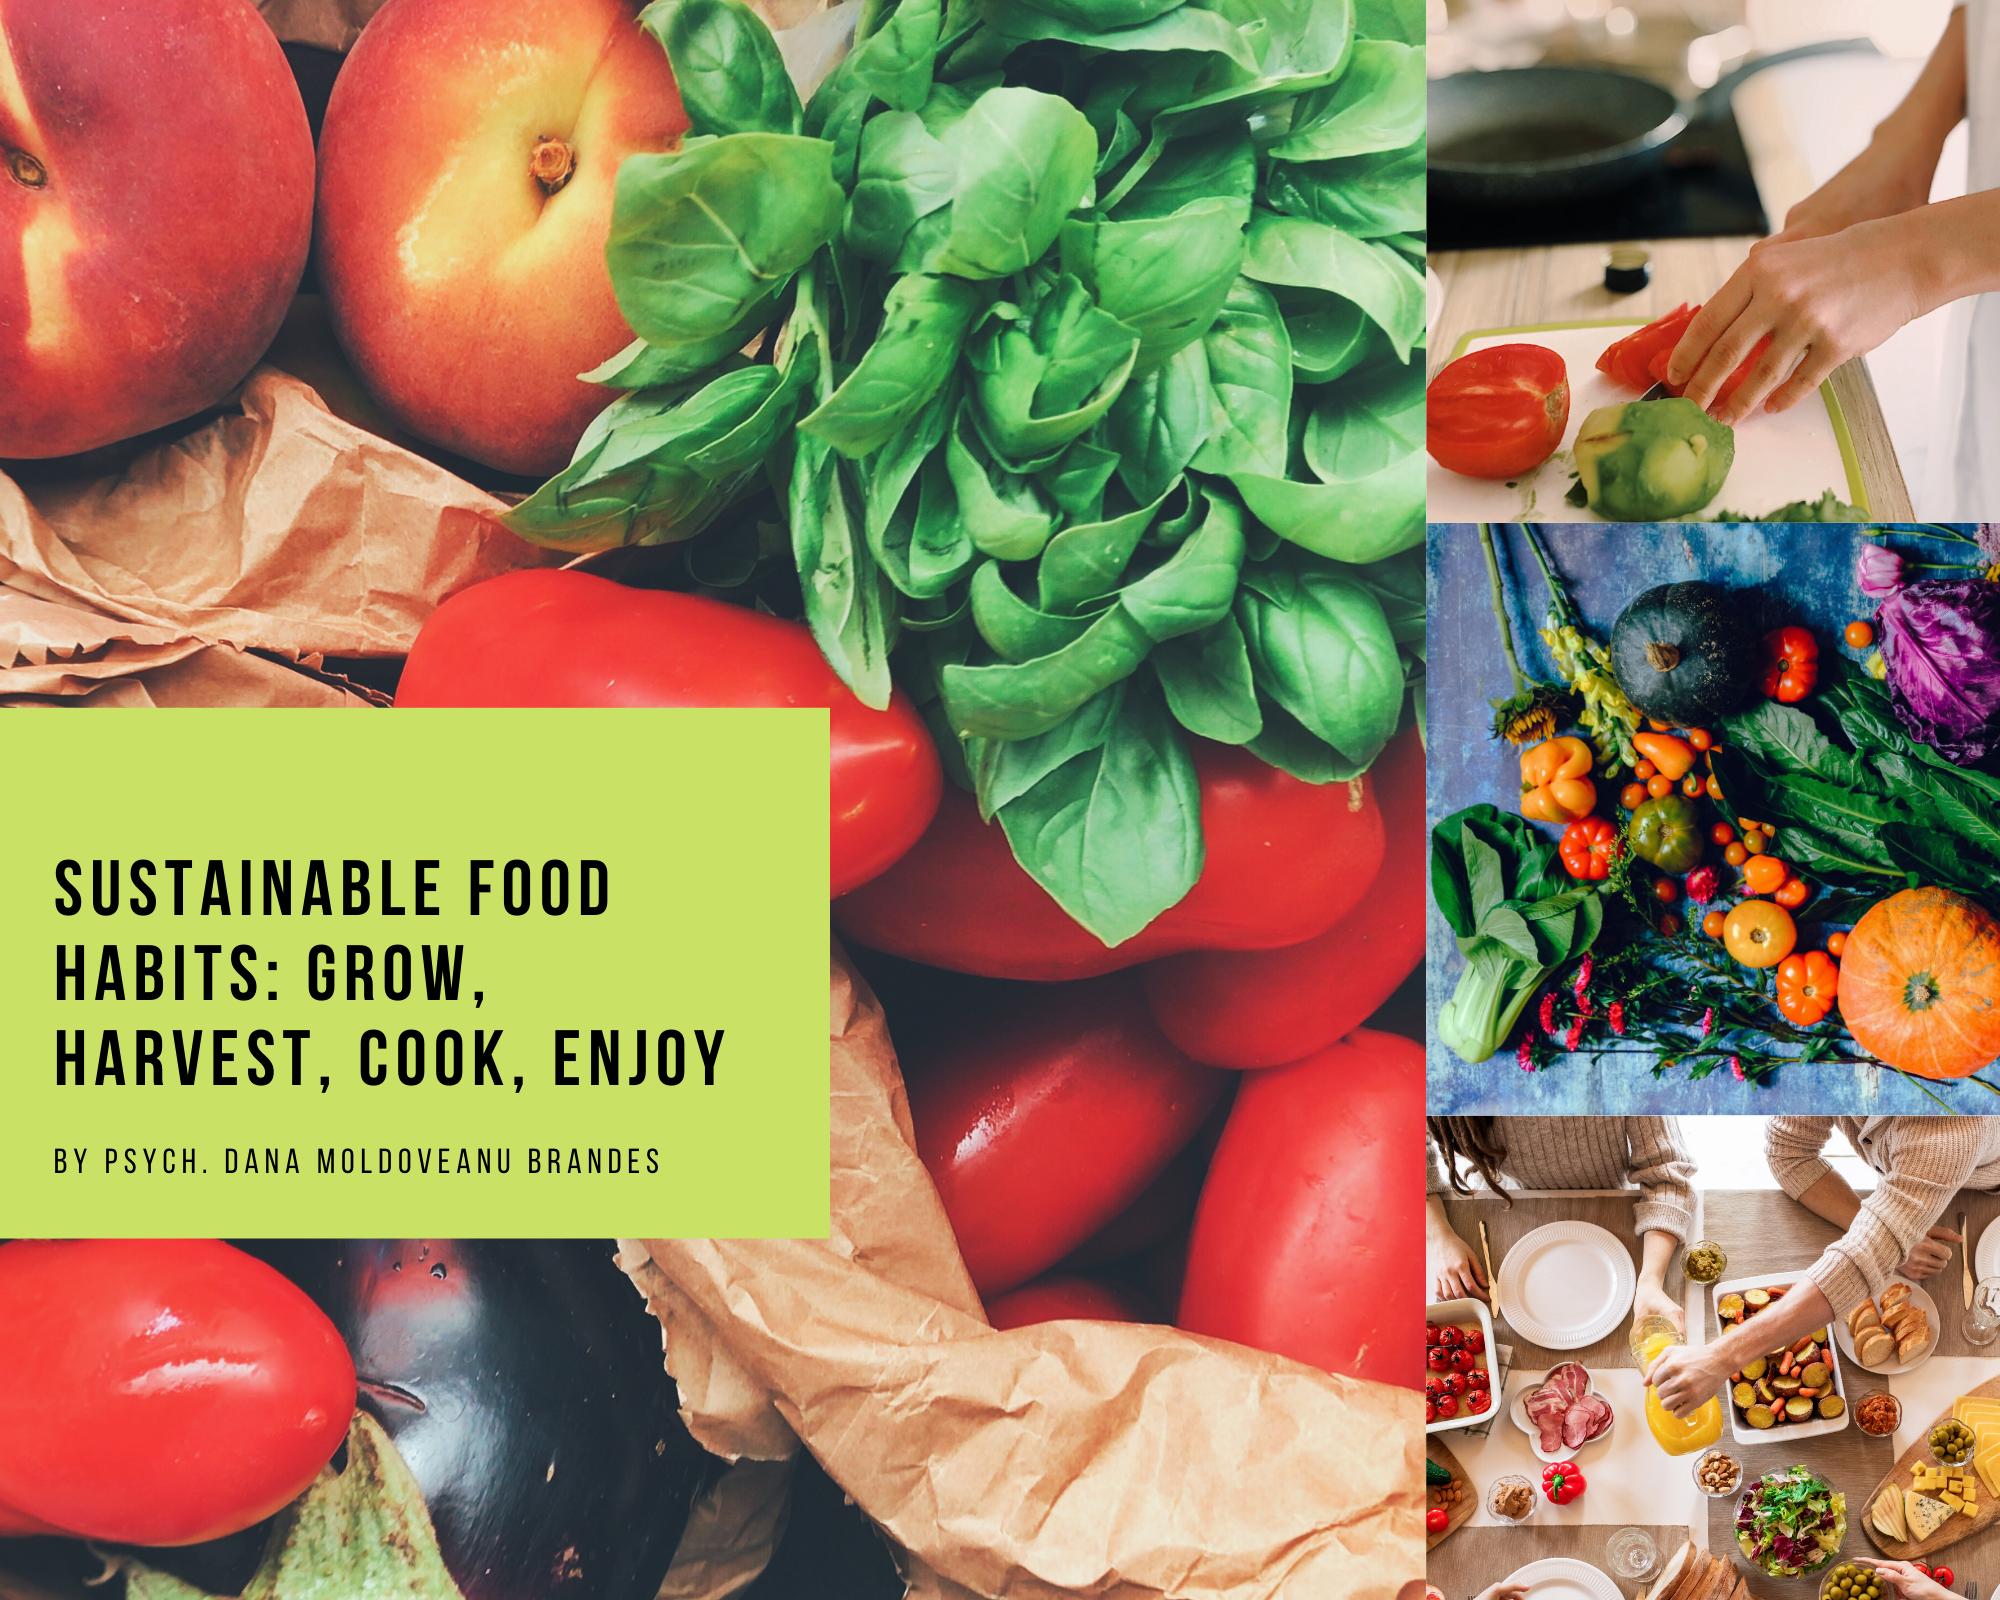 Sustainable food habits: grow, harvest, cook, enjoy!